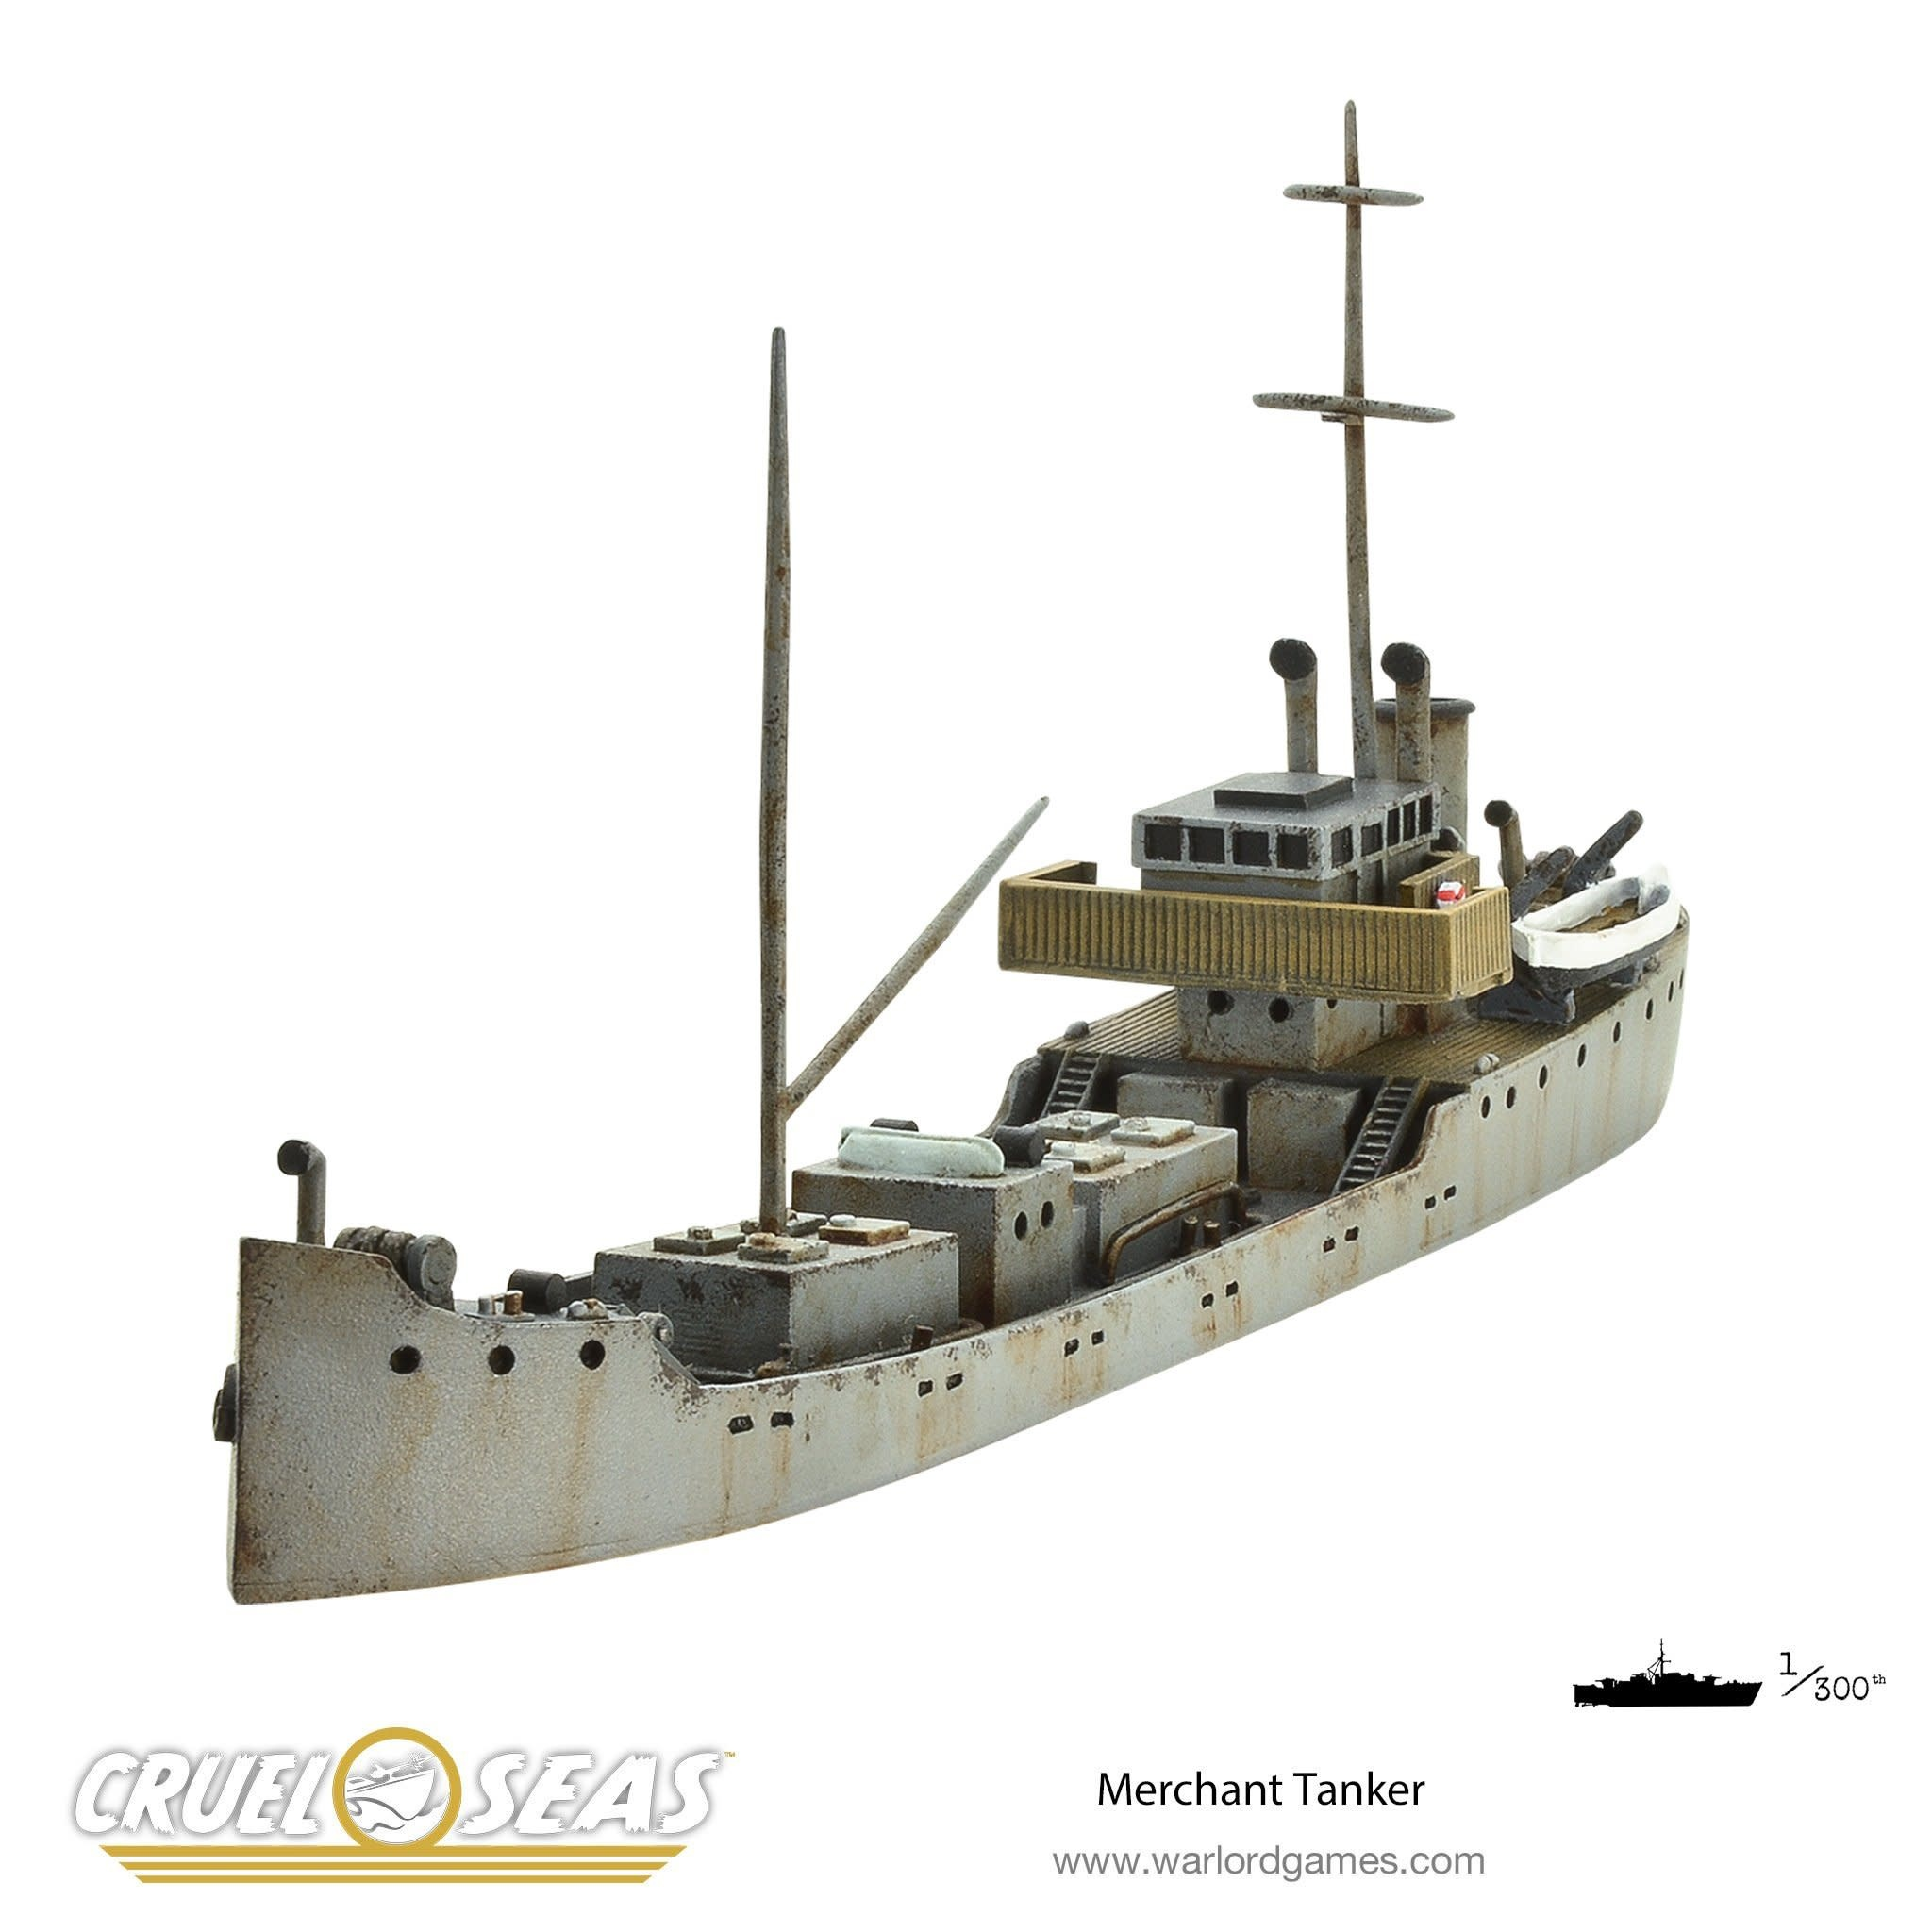 Warlord games Cruel Seas: Merchant Tanker